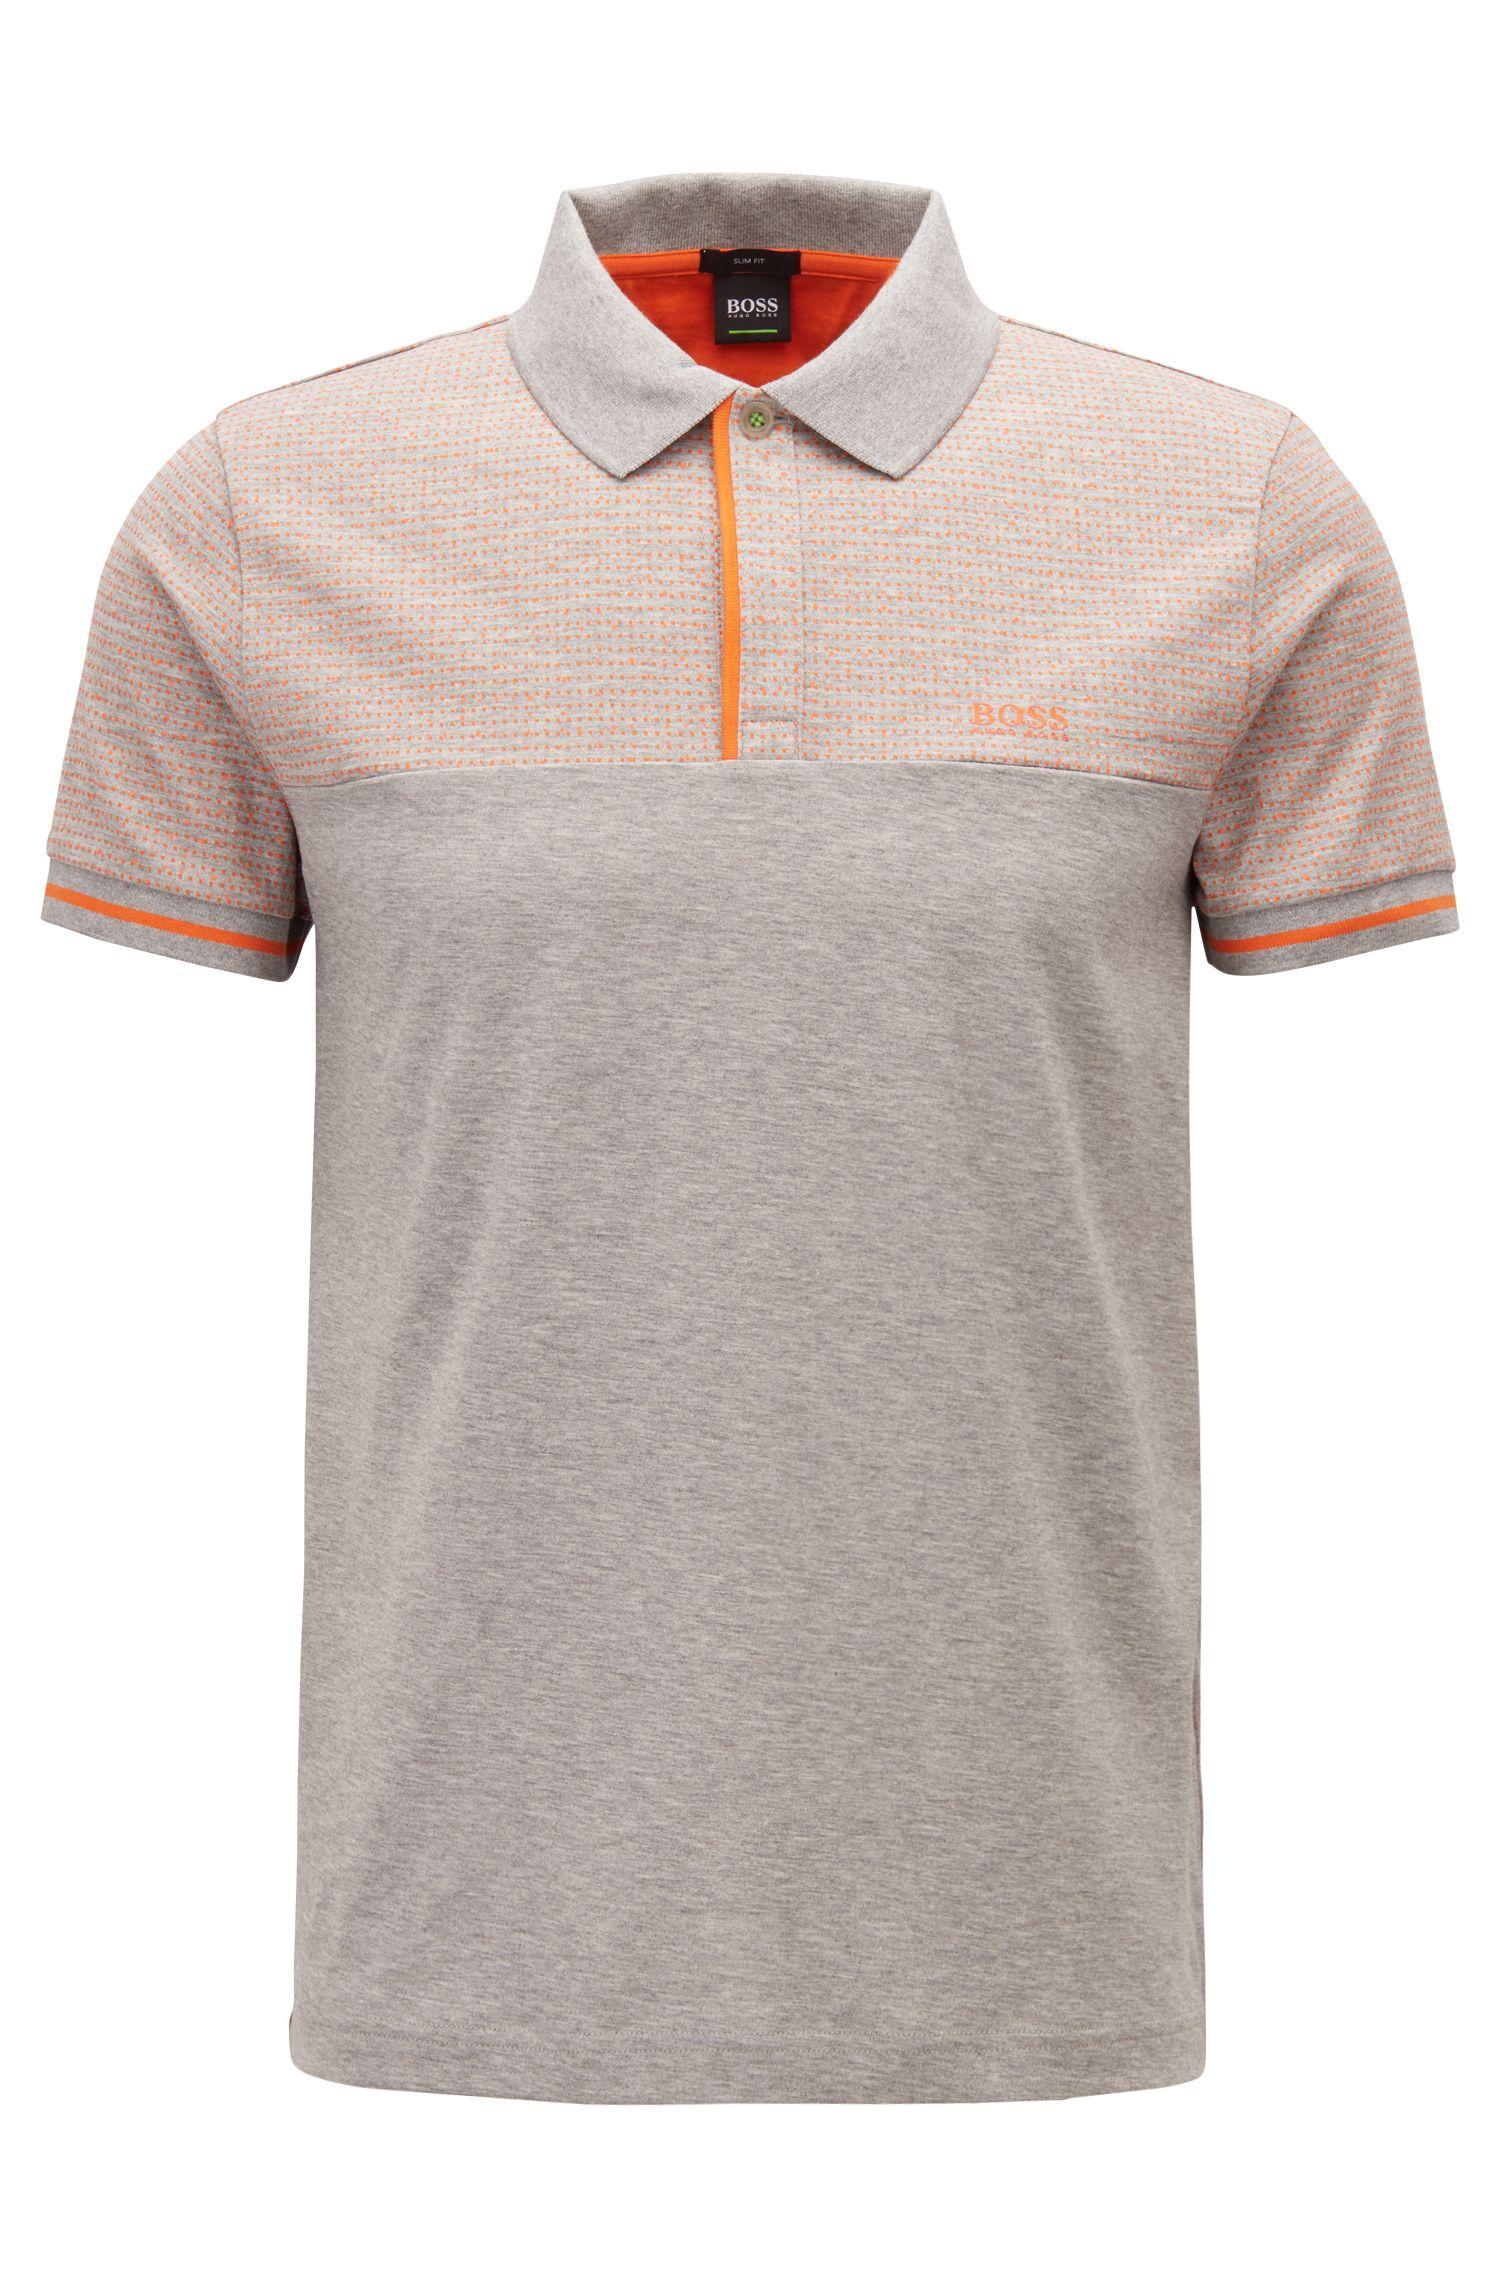 Meliertes Poloshirt aus Baumwolle im Colour-Block-Design